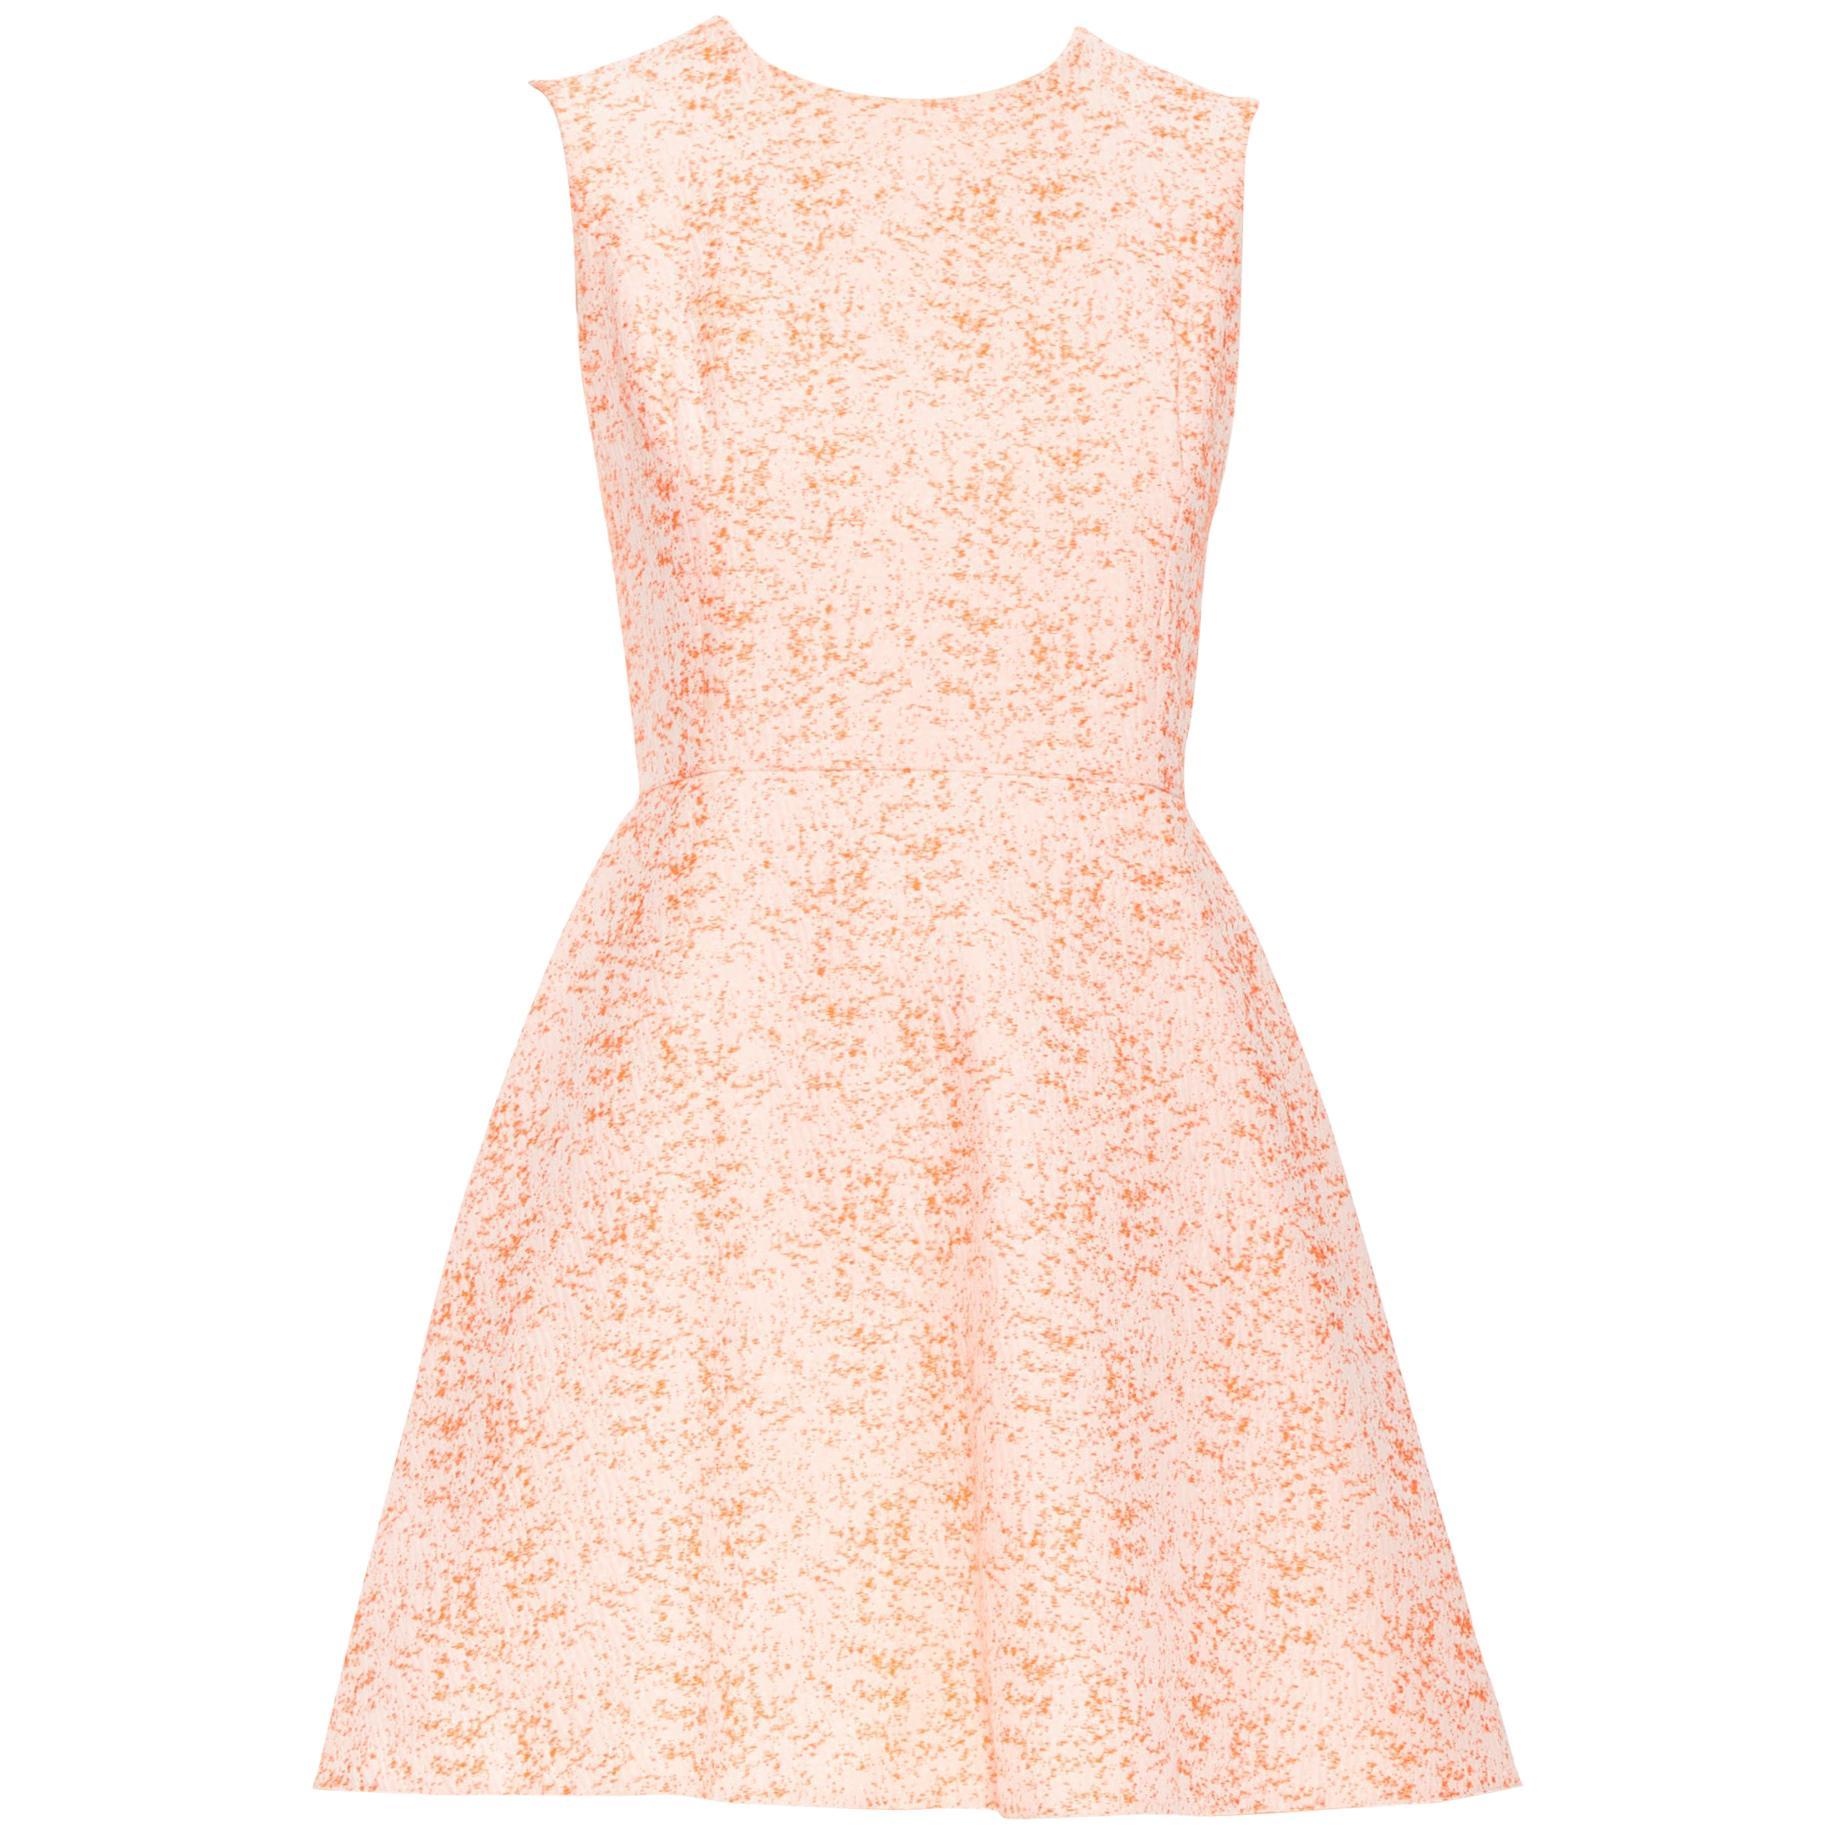 CHRISTIAN DIOR neon orange cotton jacquard fit flared cocktail dress FR34 XS